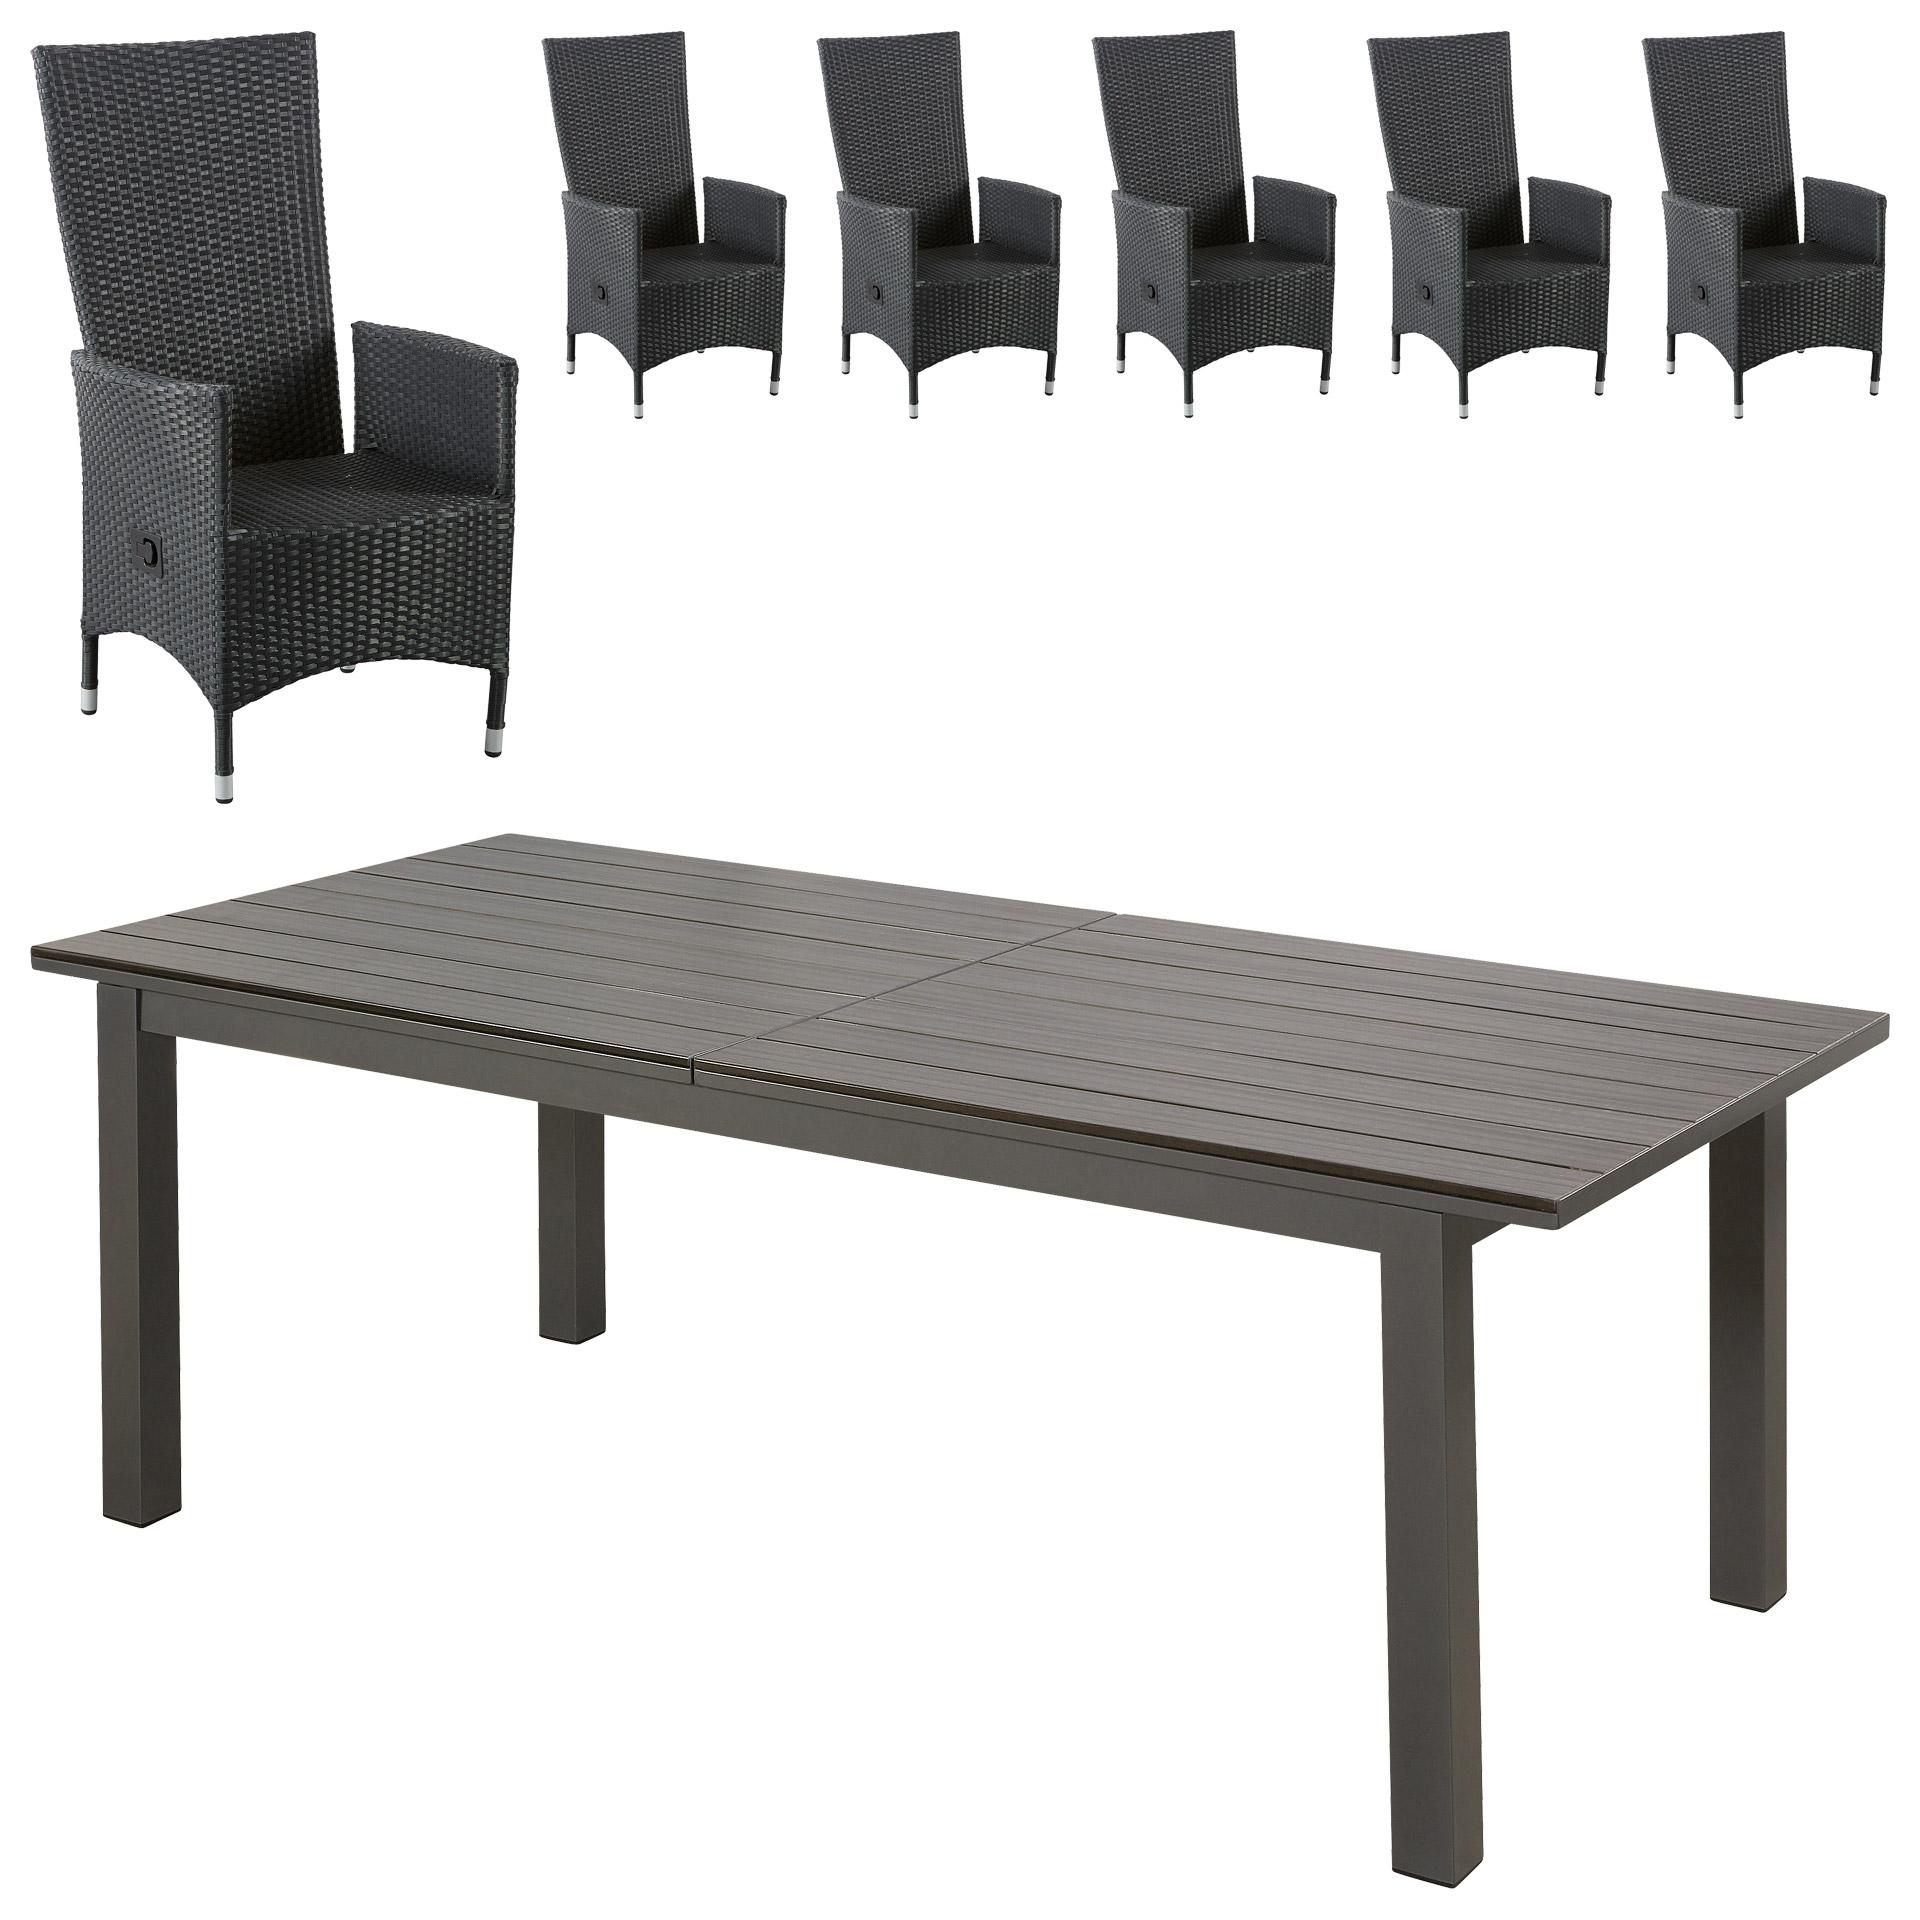 gartenm bel set california rio grande 100 4x226 6 komfortsessel schwarz gro e auswahl. Black Bedroom Furniture Sets. Home Design Ideas